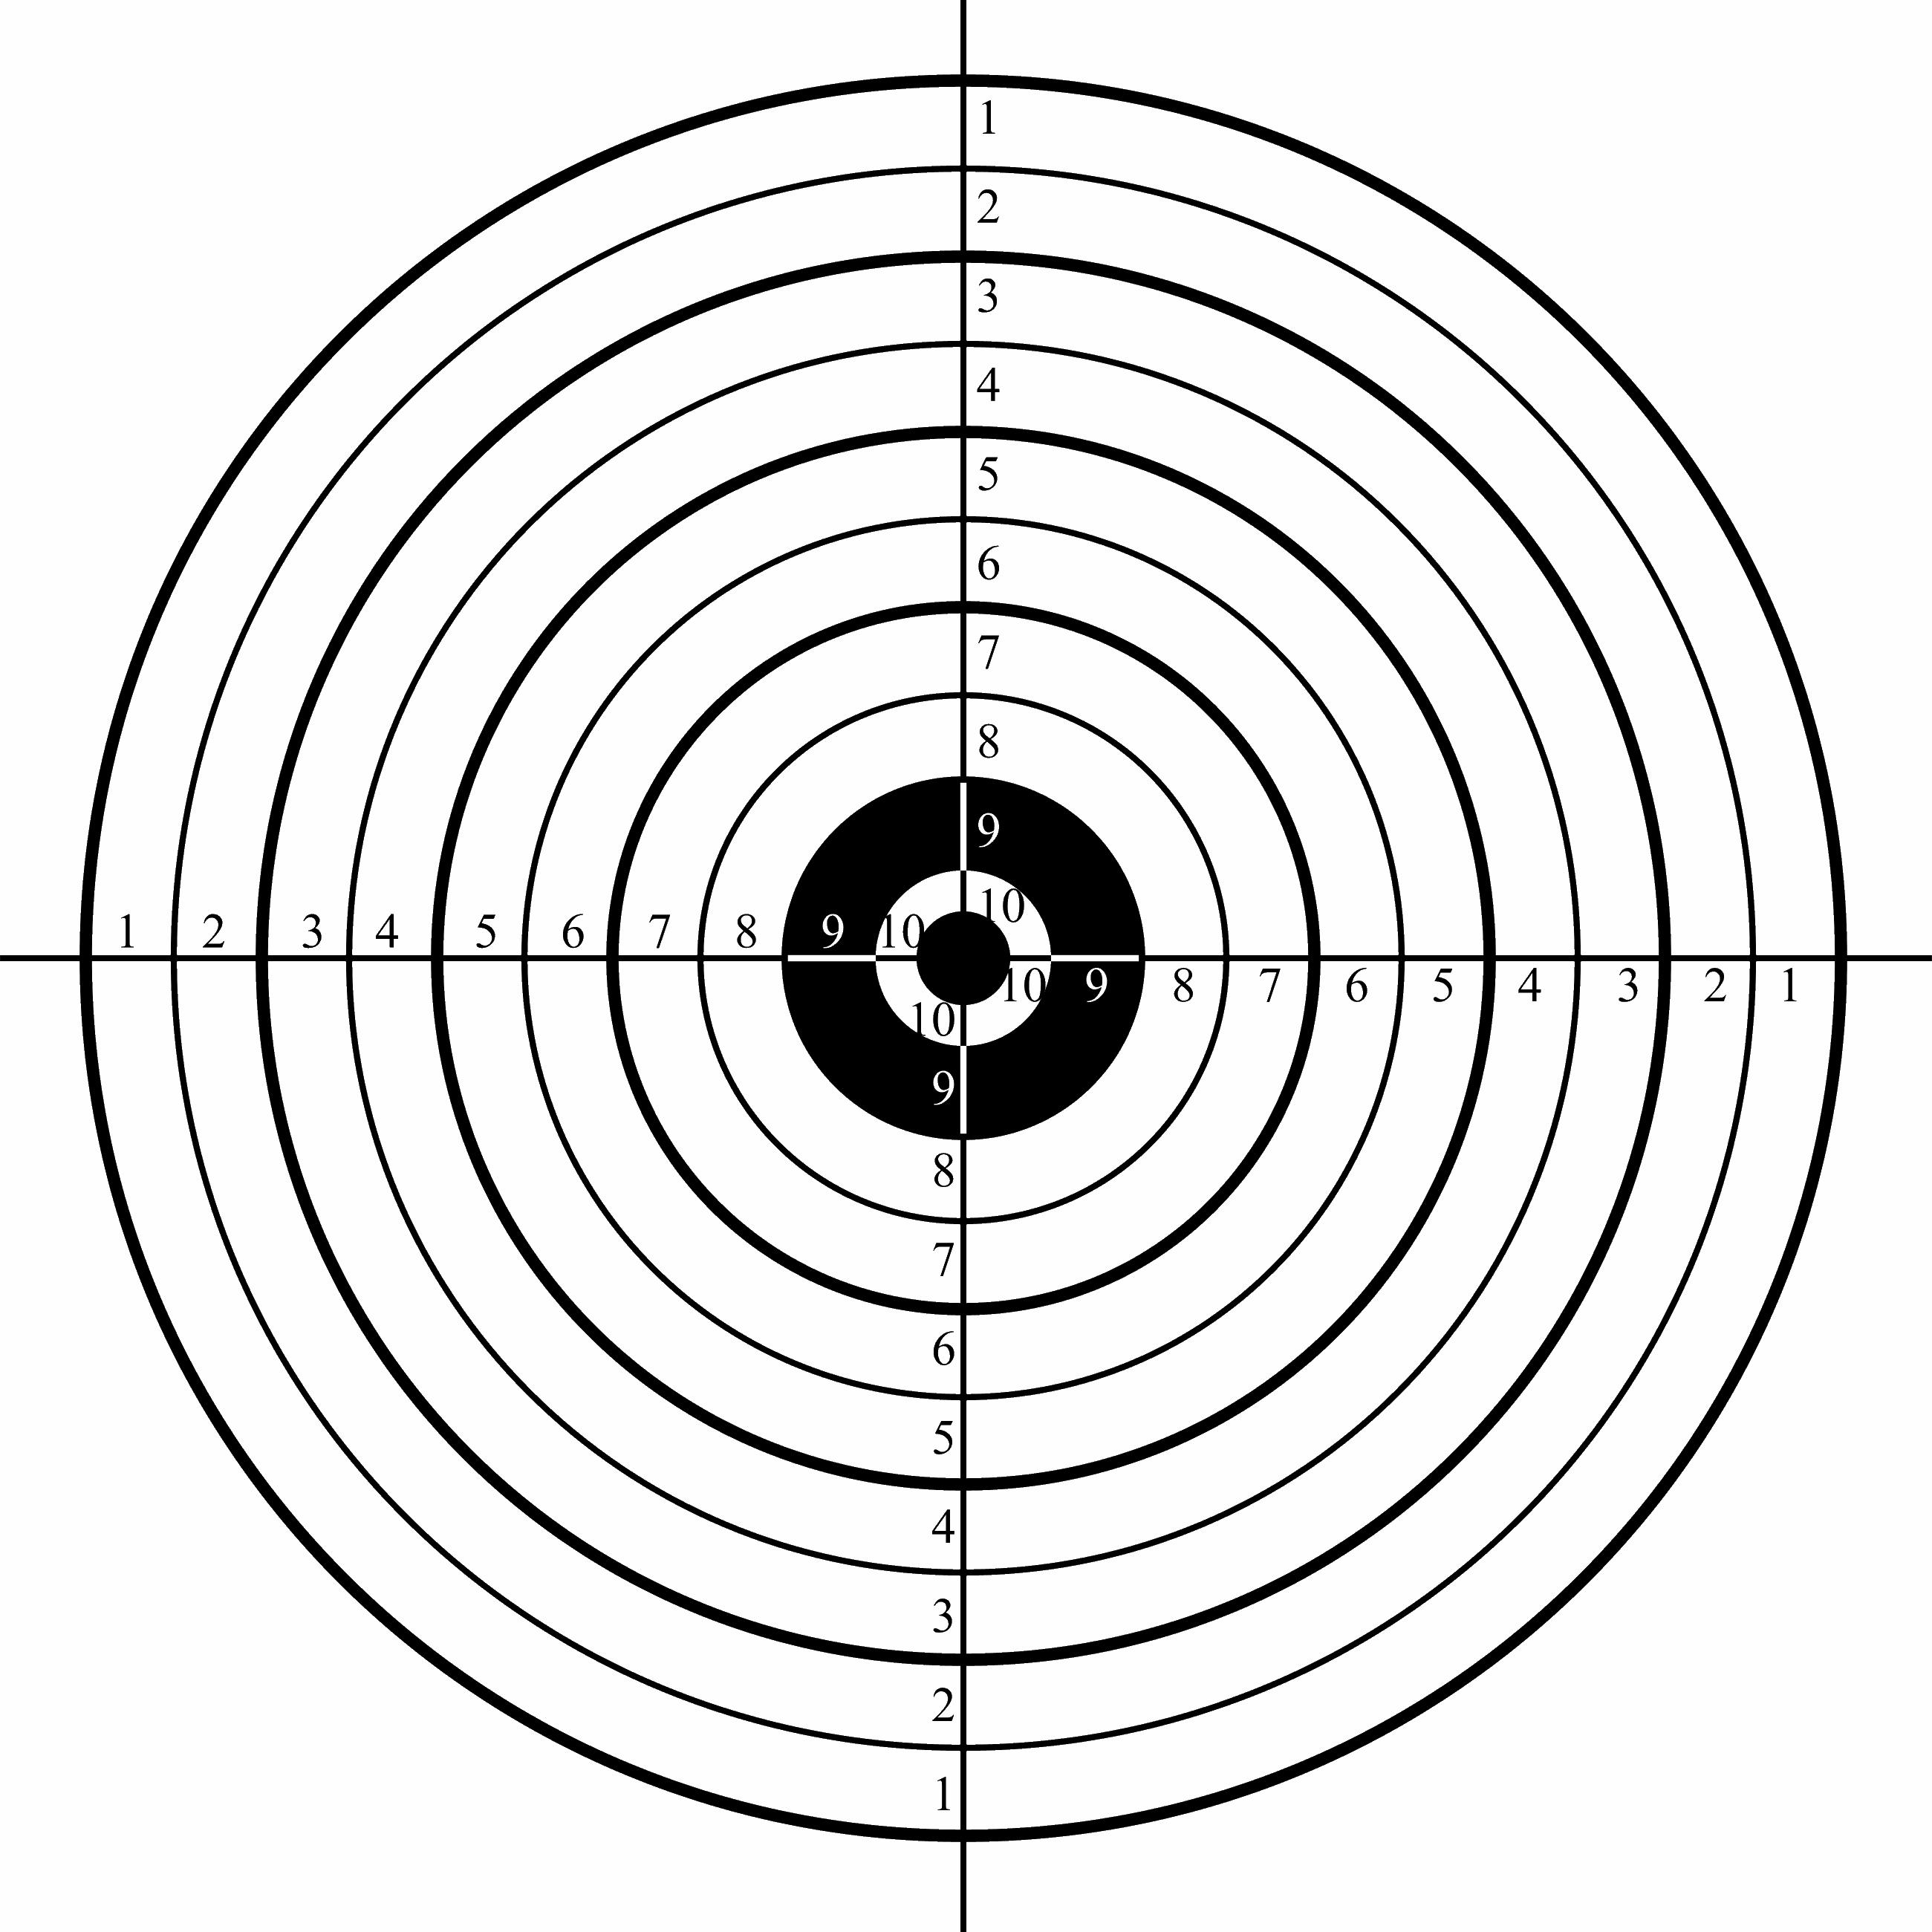 Shot clipart shooting range. Free target cliparts download